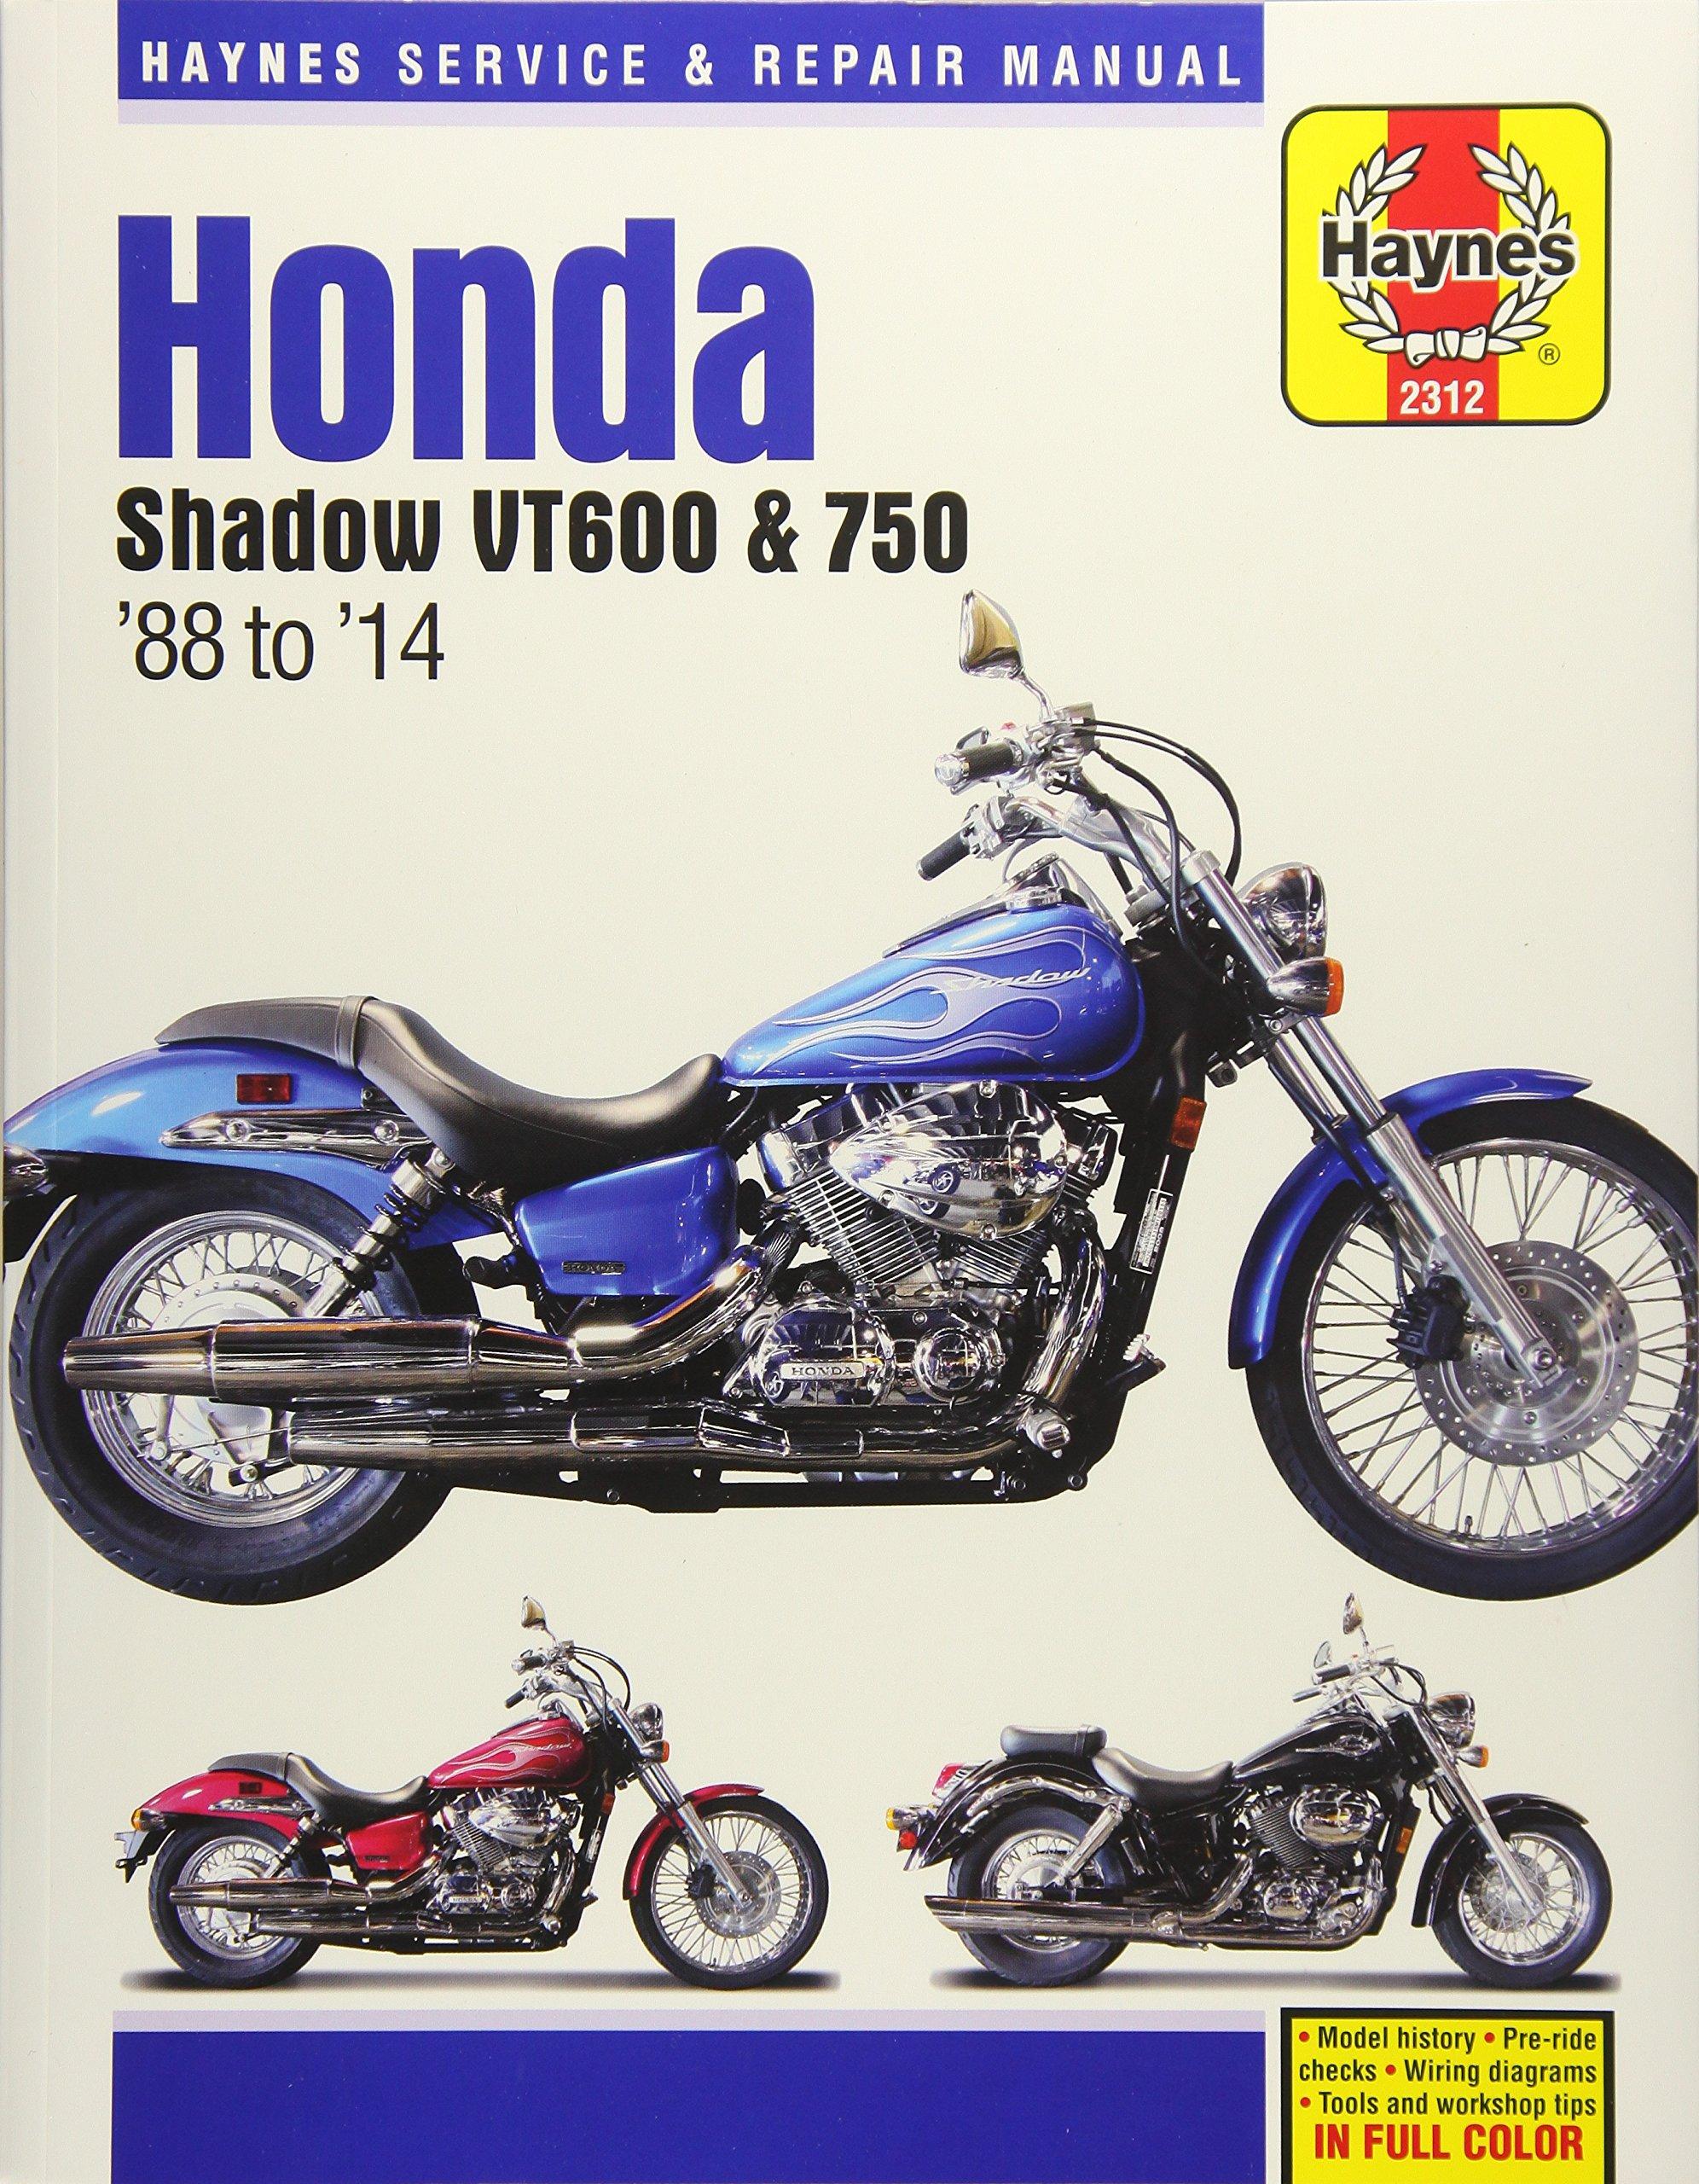 Honda Shadow VT600 & 750 '88 to '14 (Haynes Service & Repair Manual):  Editors of Haynes Manuals: 9781620922224: Amazon.com: Books